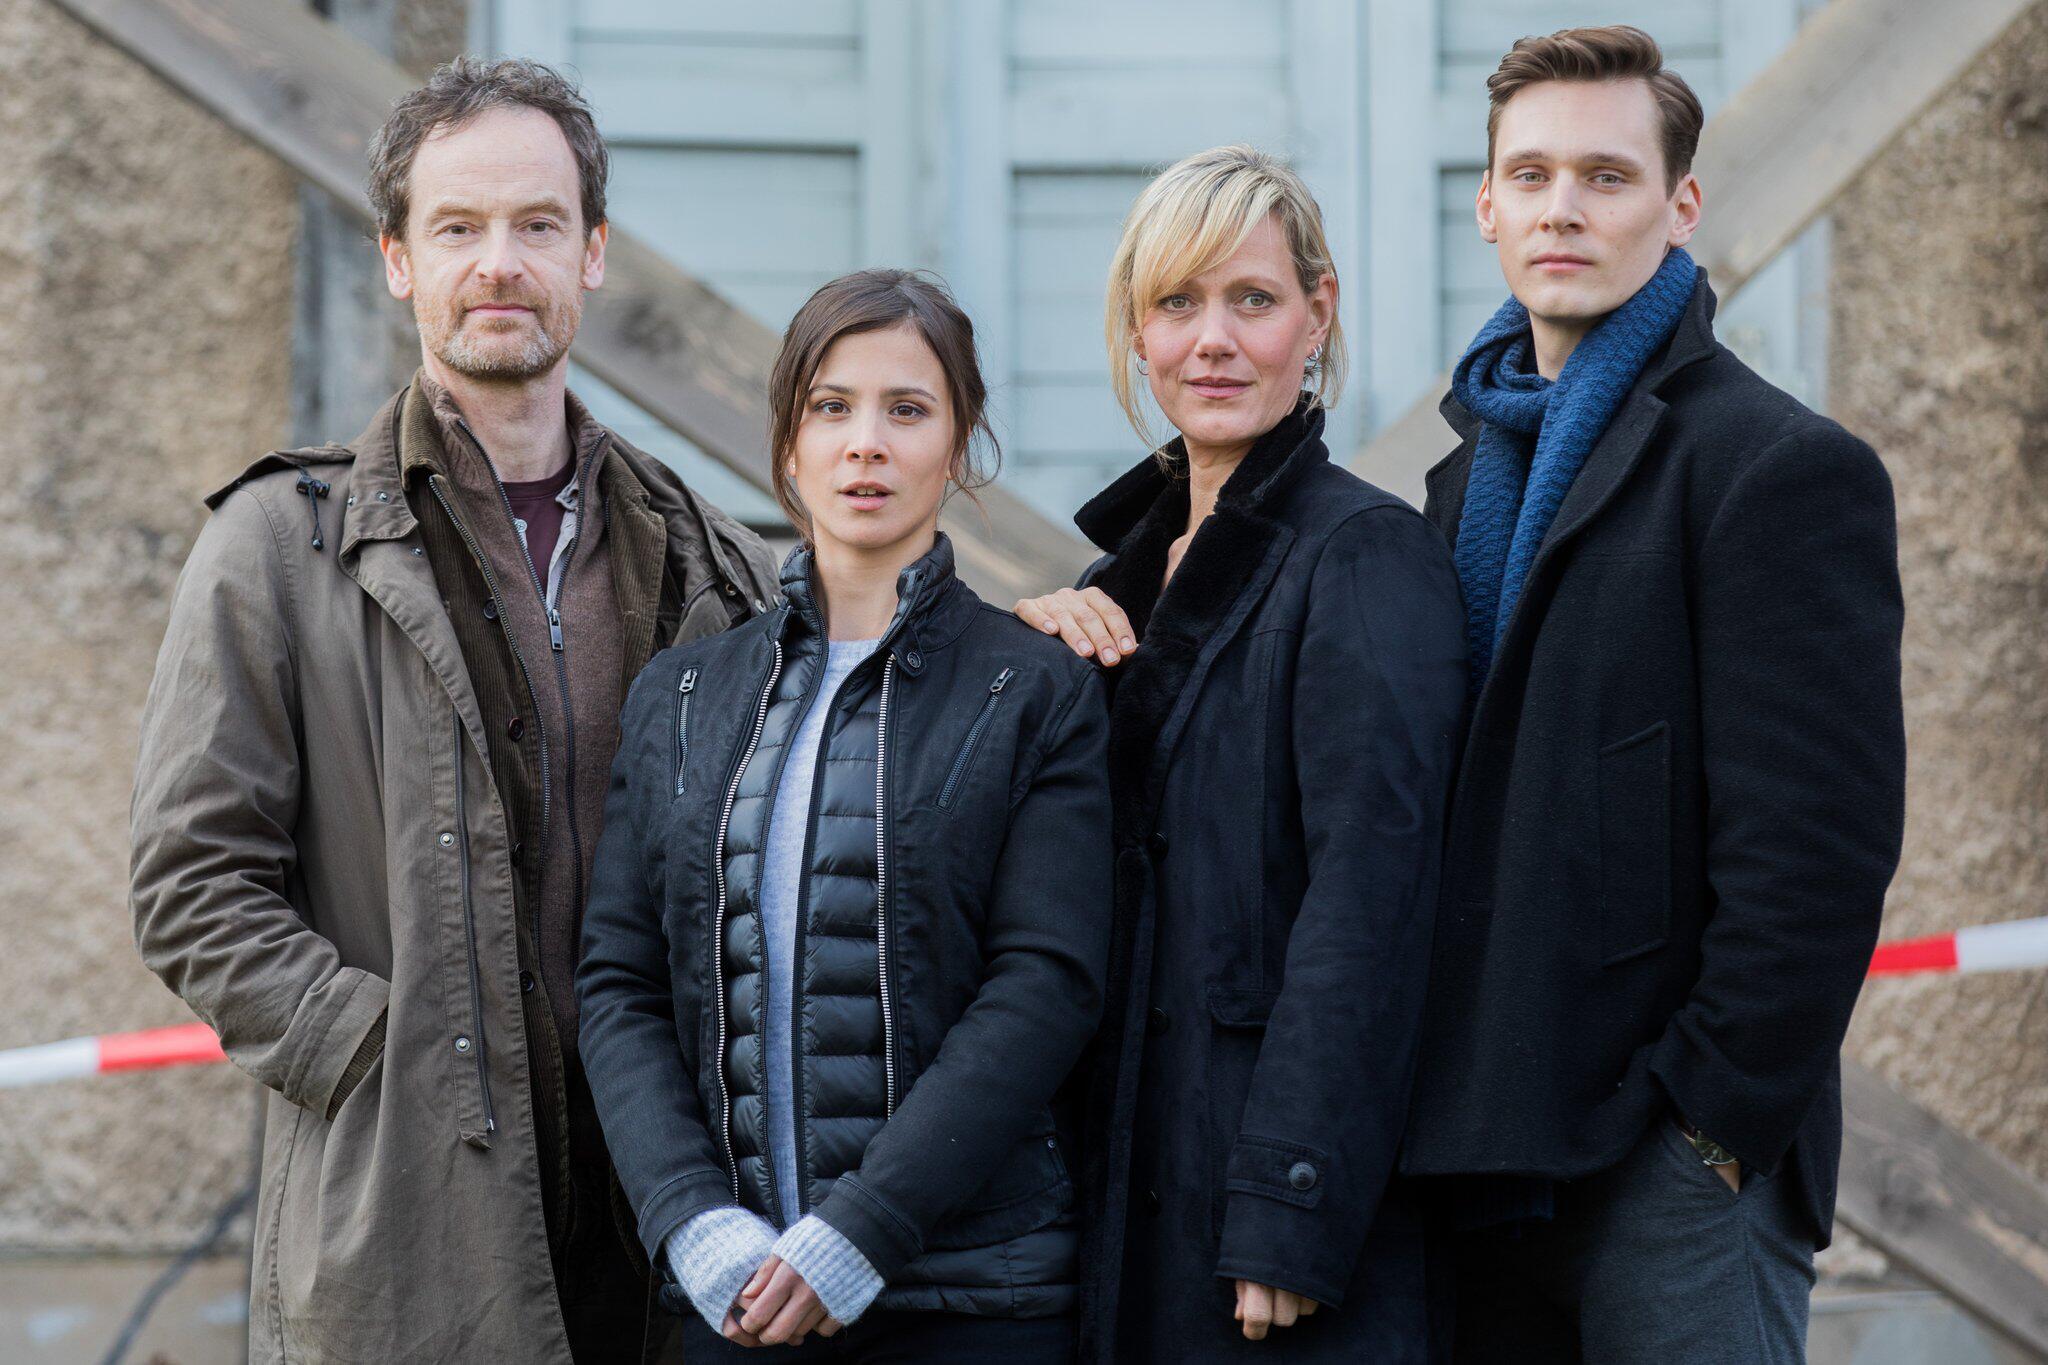 Bild zu Tatort Dortmund, Jörg Hartmann, Aylin Tezel, Anna Schudt, Rick Okon